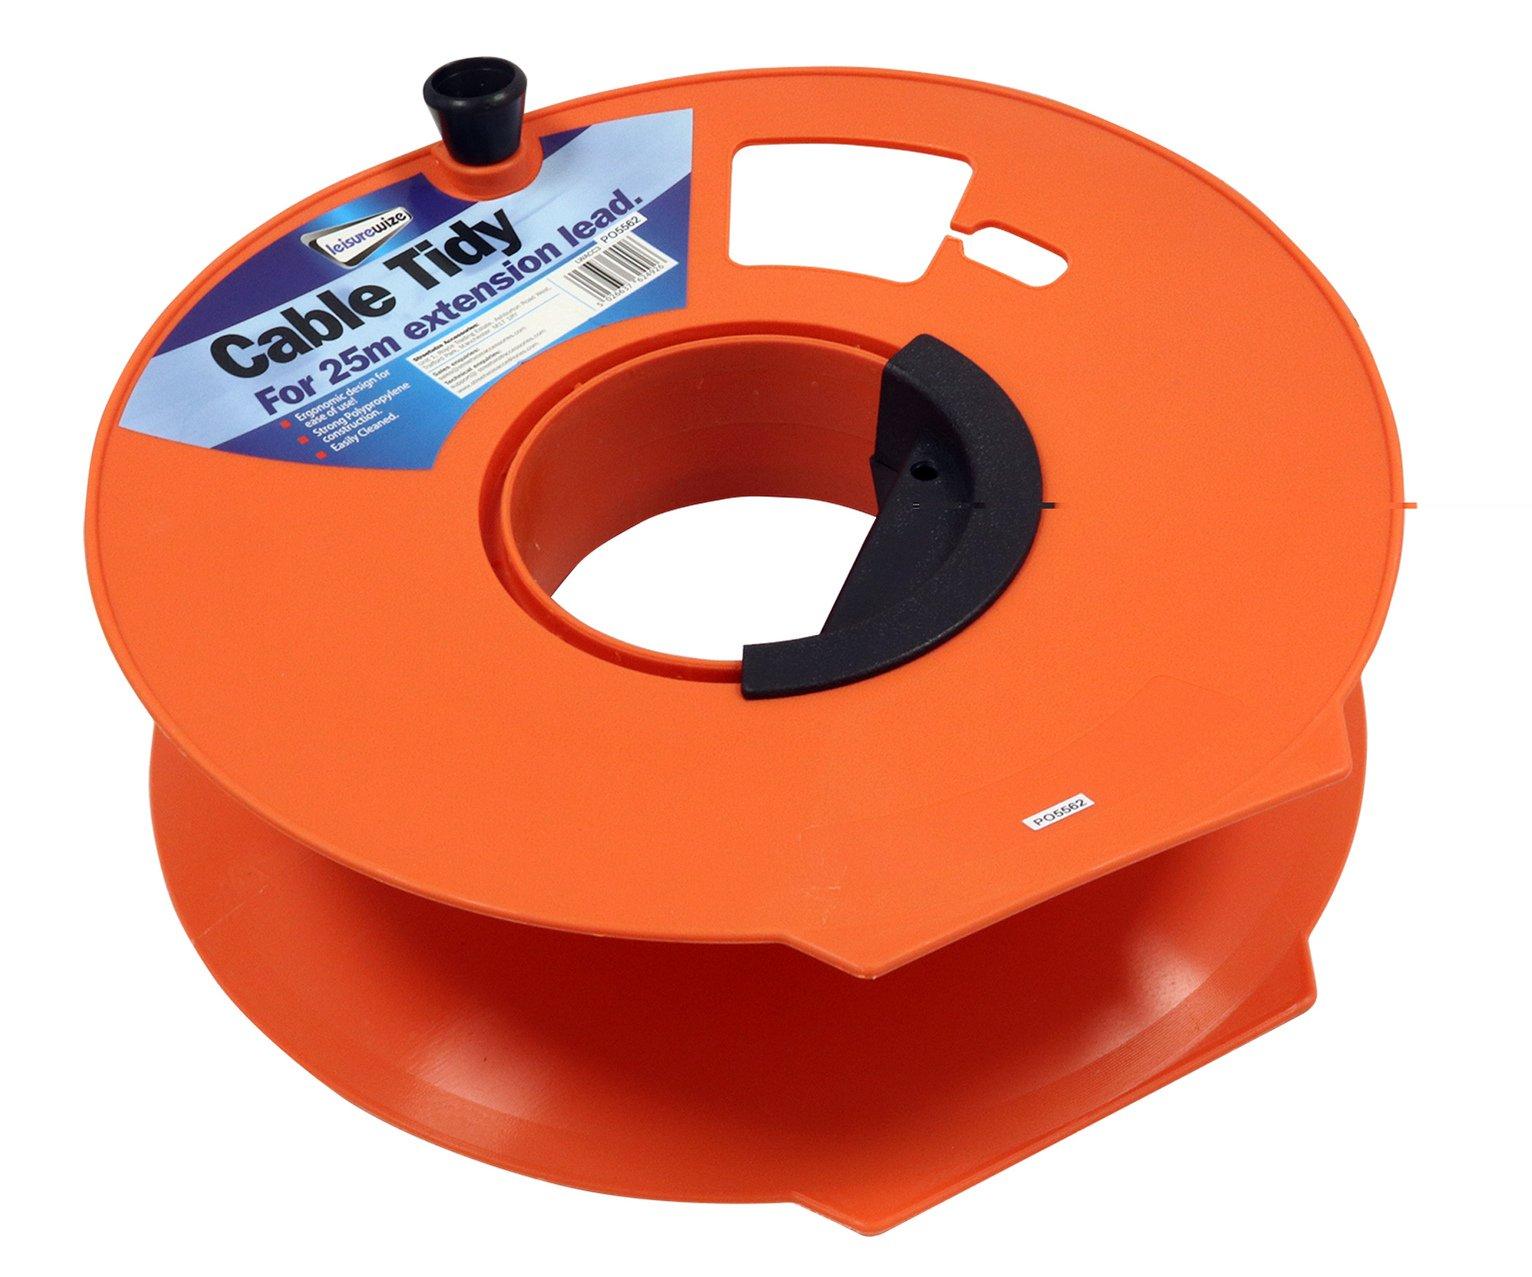 Leisurewize 25 Metre Cord Wheel